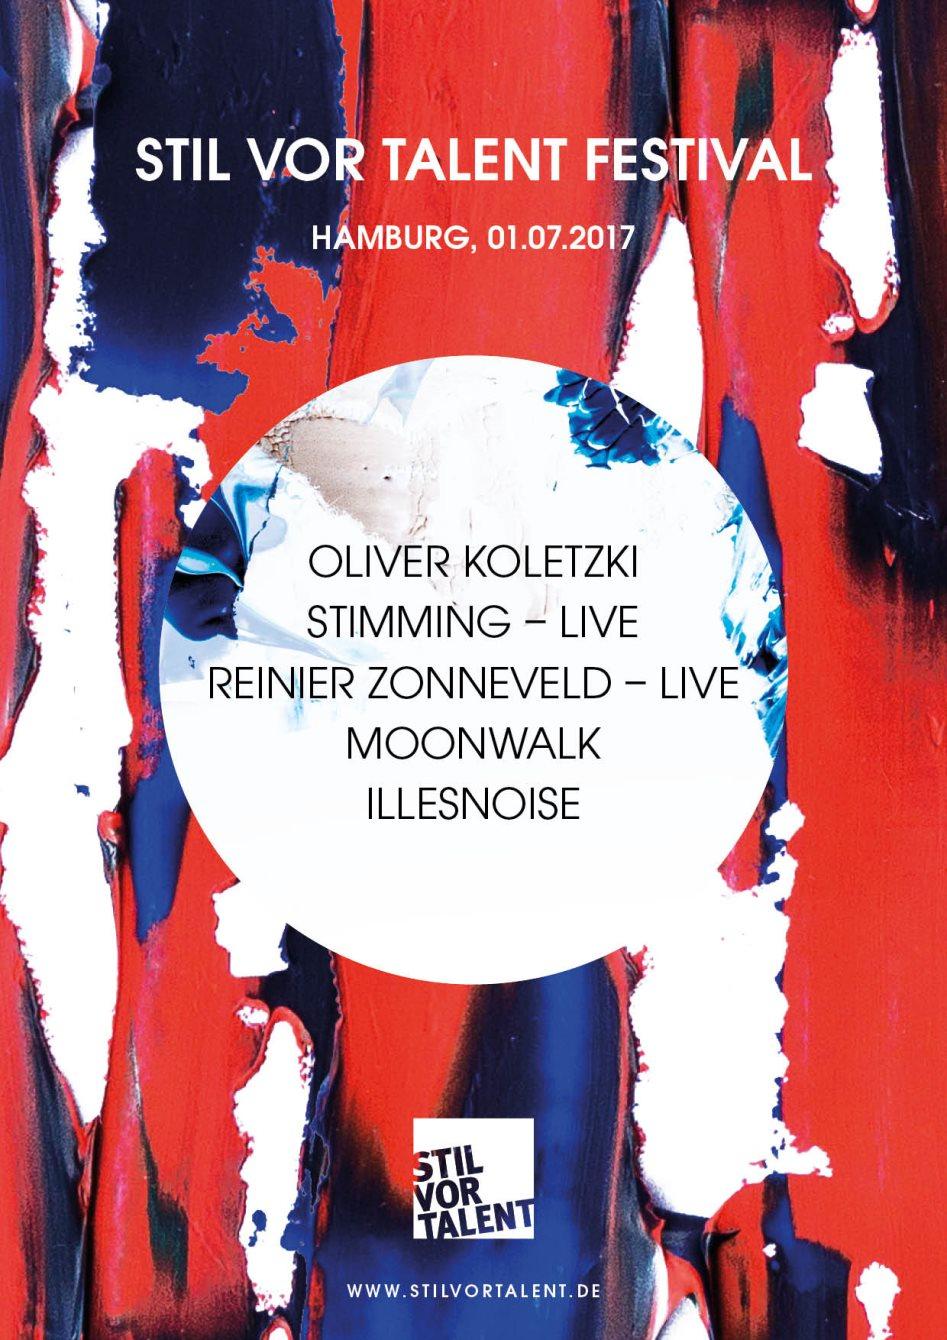 Len Design Hamburg ra stil vor talent festival hamburg at ms dockville hamburg 2017